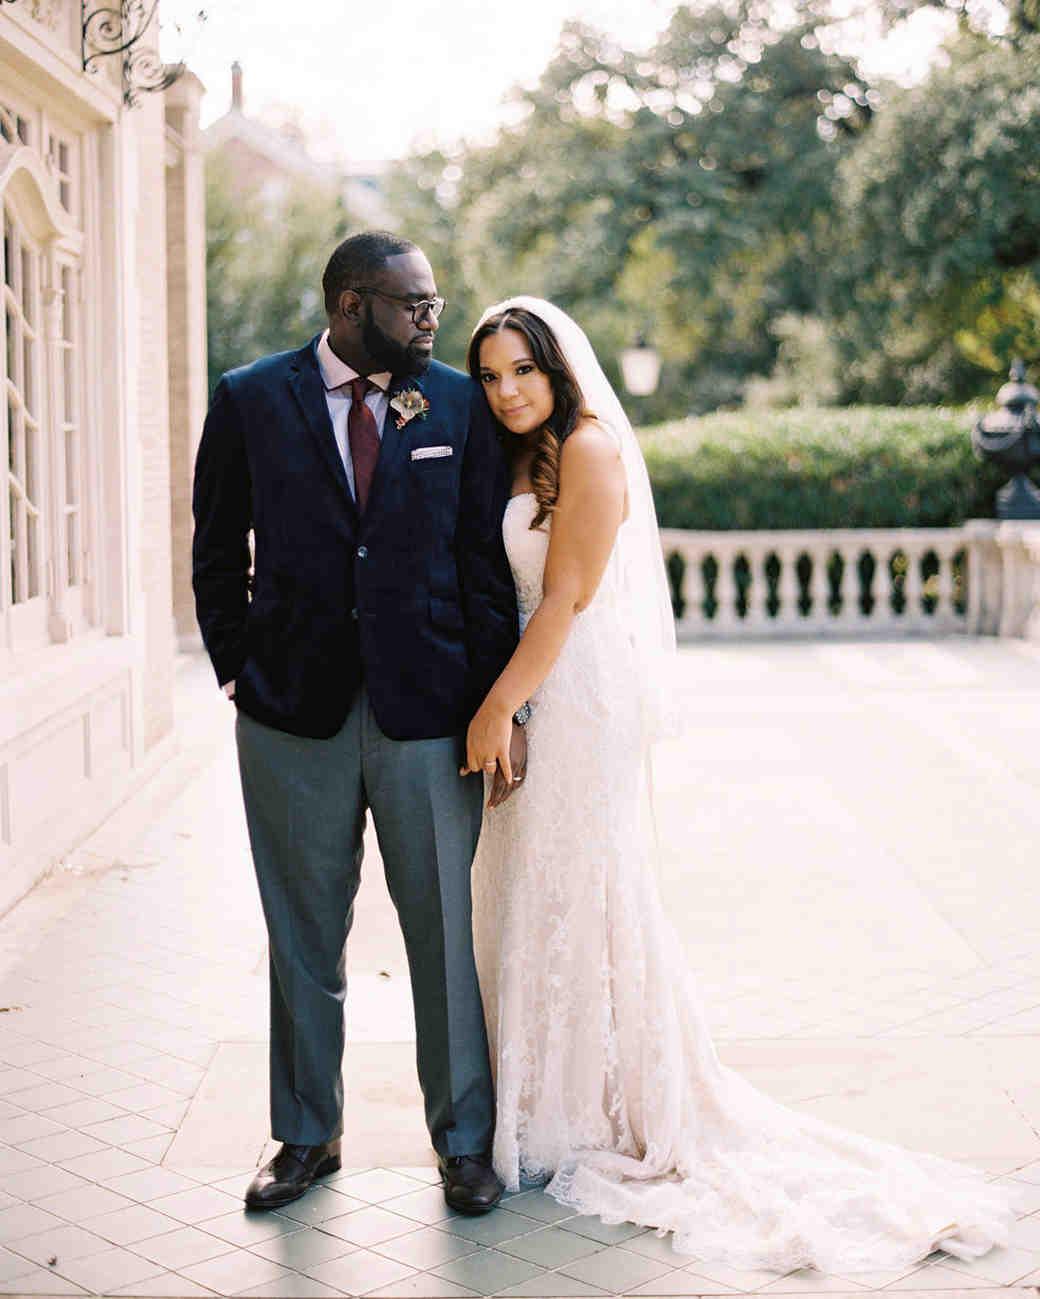 A Heartfelt Intimate Wedding At A Historic Texan Home